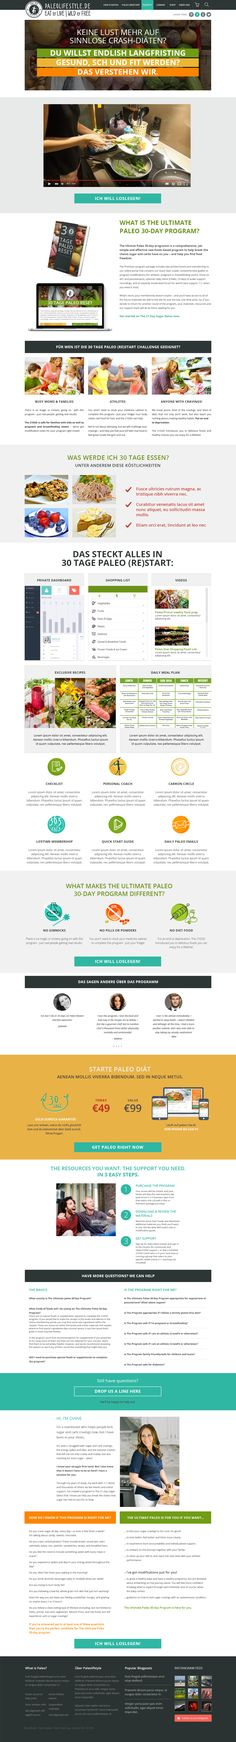 Landing page design, branding, icons Landing Page Design, More Words, Branding, Icons, Brand Management, Symbols, Identity Branding, Ikon